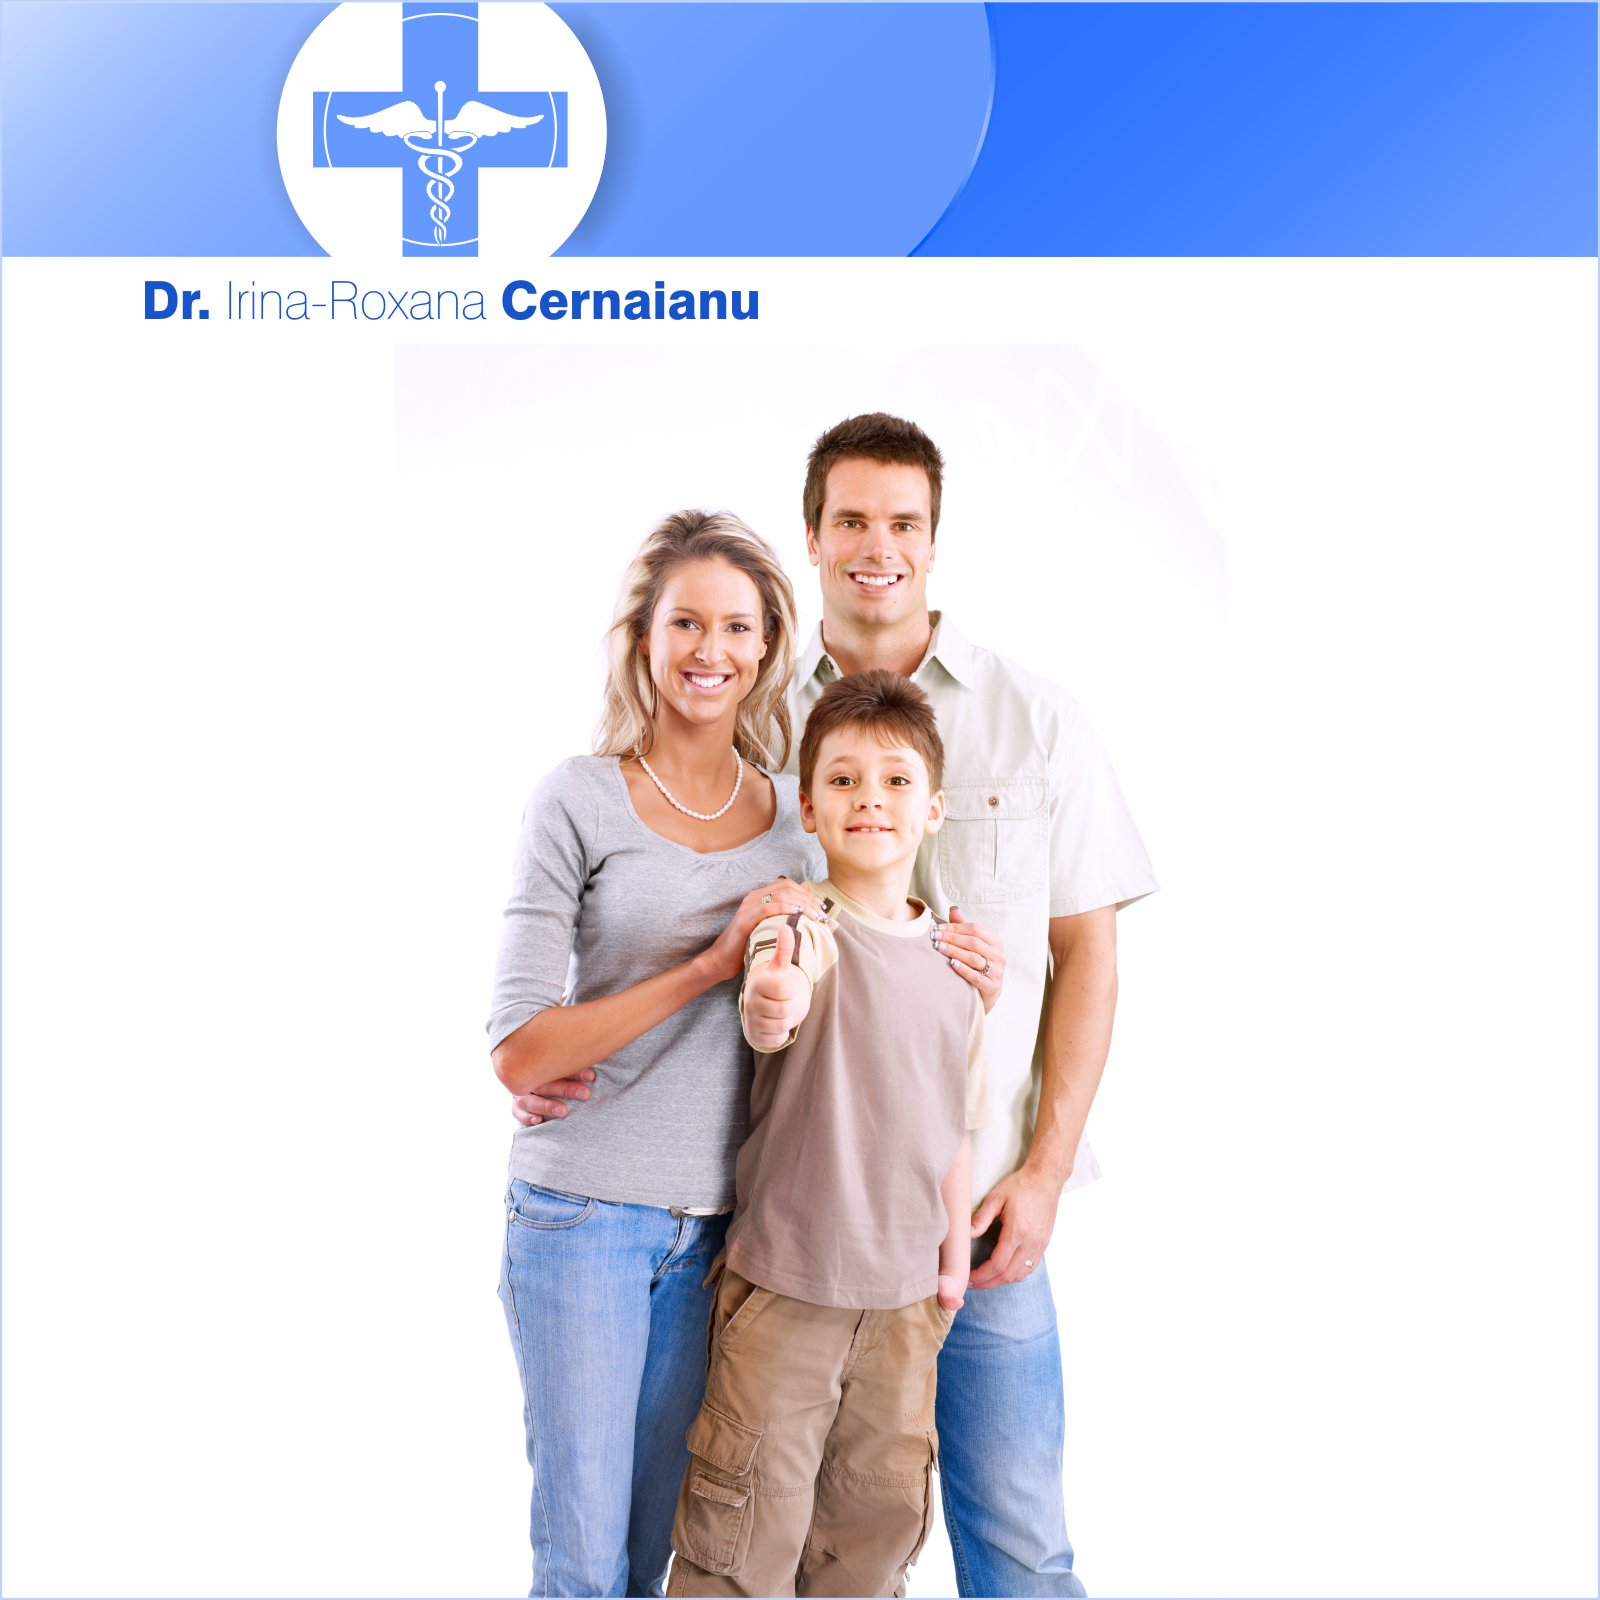 O-ZEN Portfolio Doktor Cernaianu Junge Familie Muter, Vater und Sohn